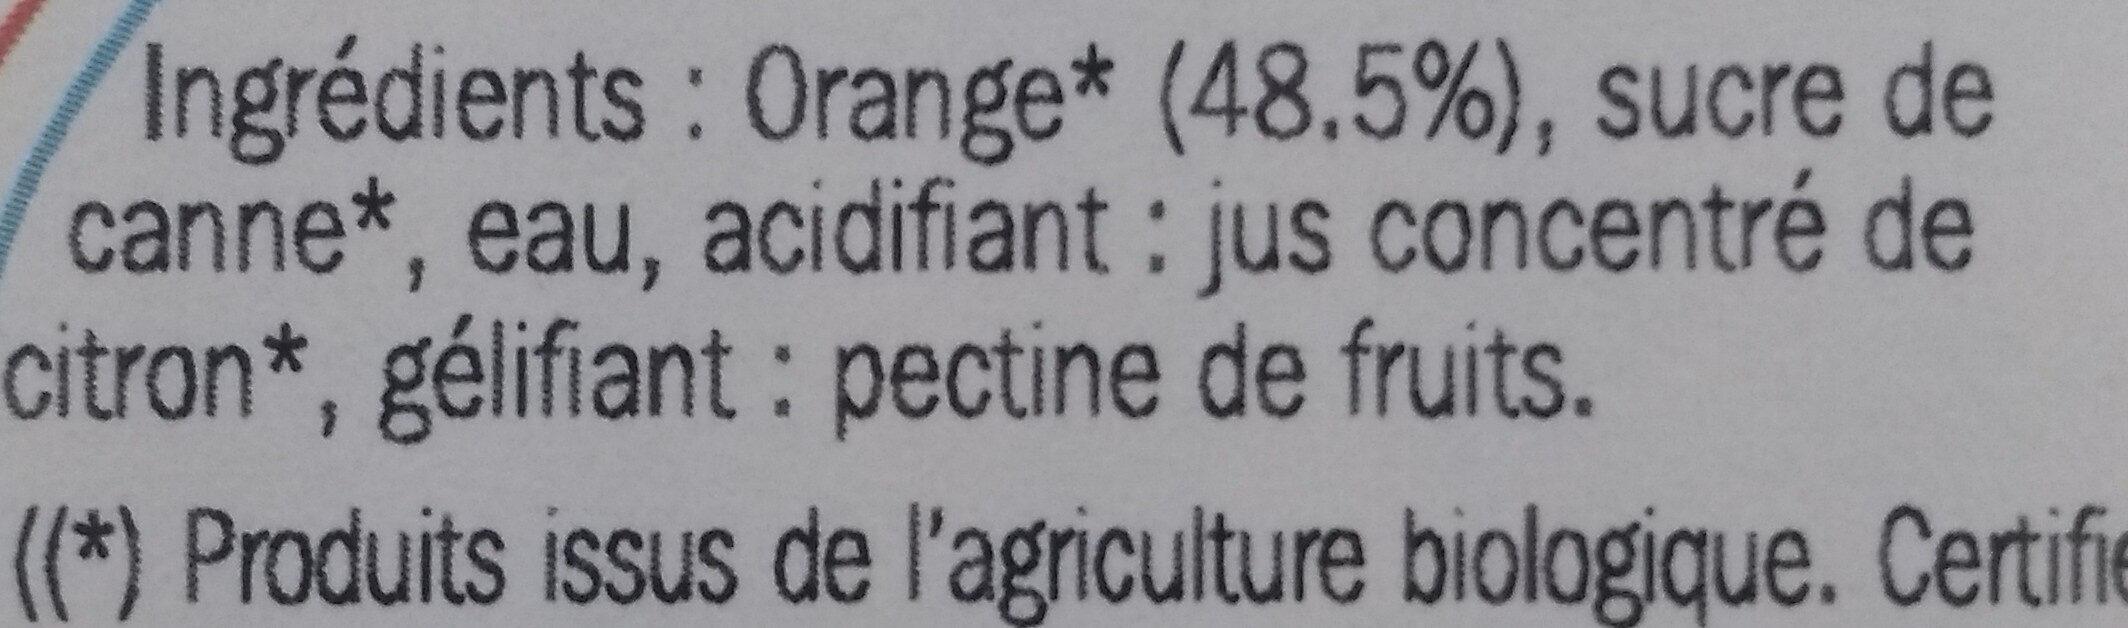 Confiture allégée oranges - Ingrediënten